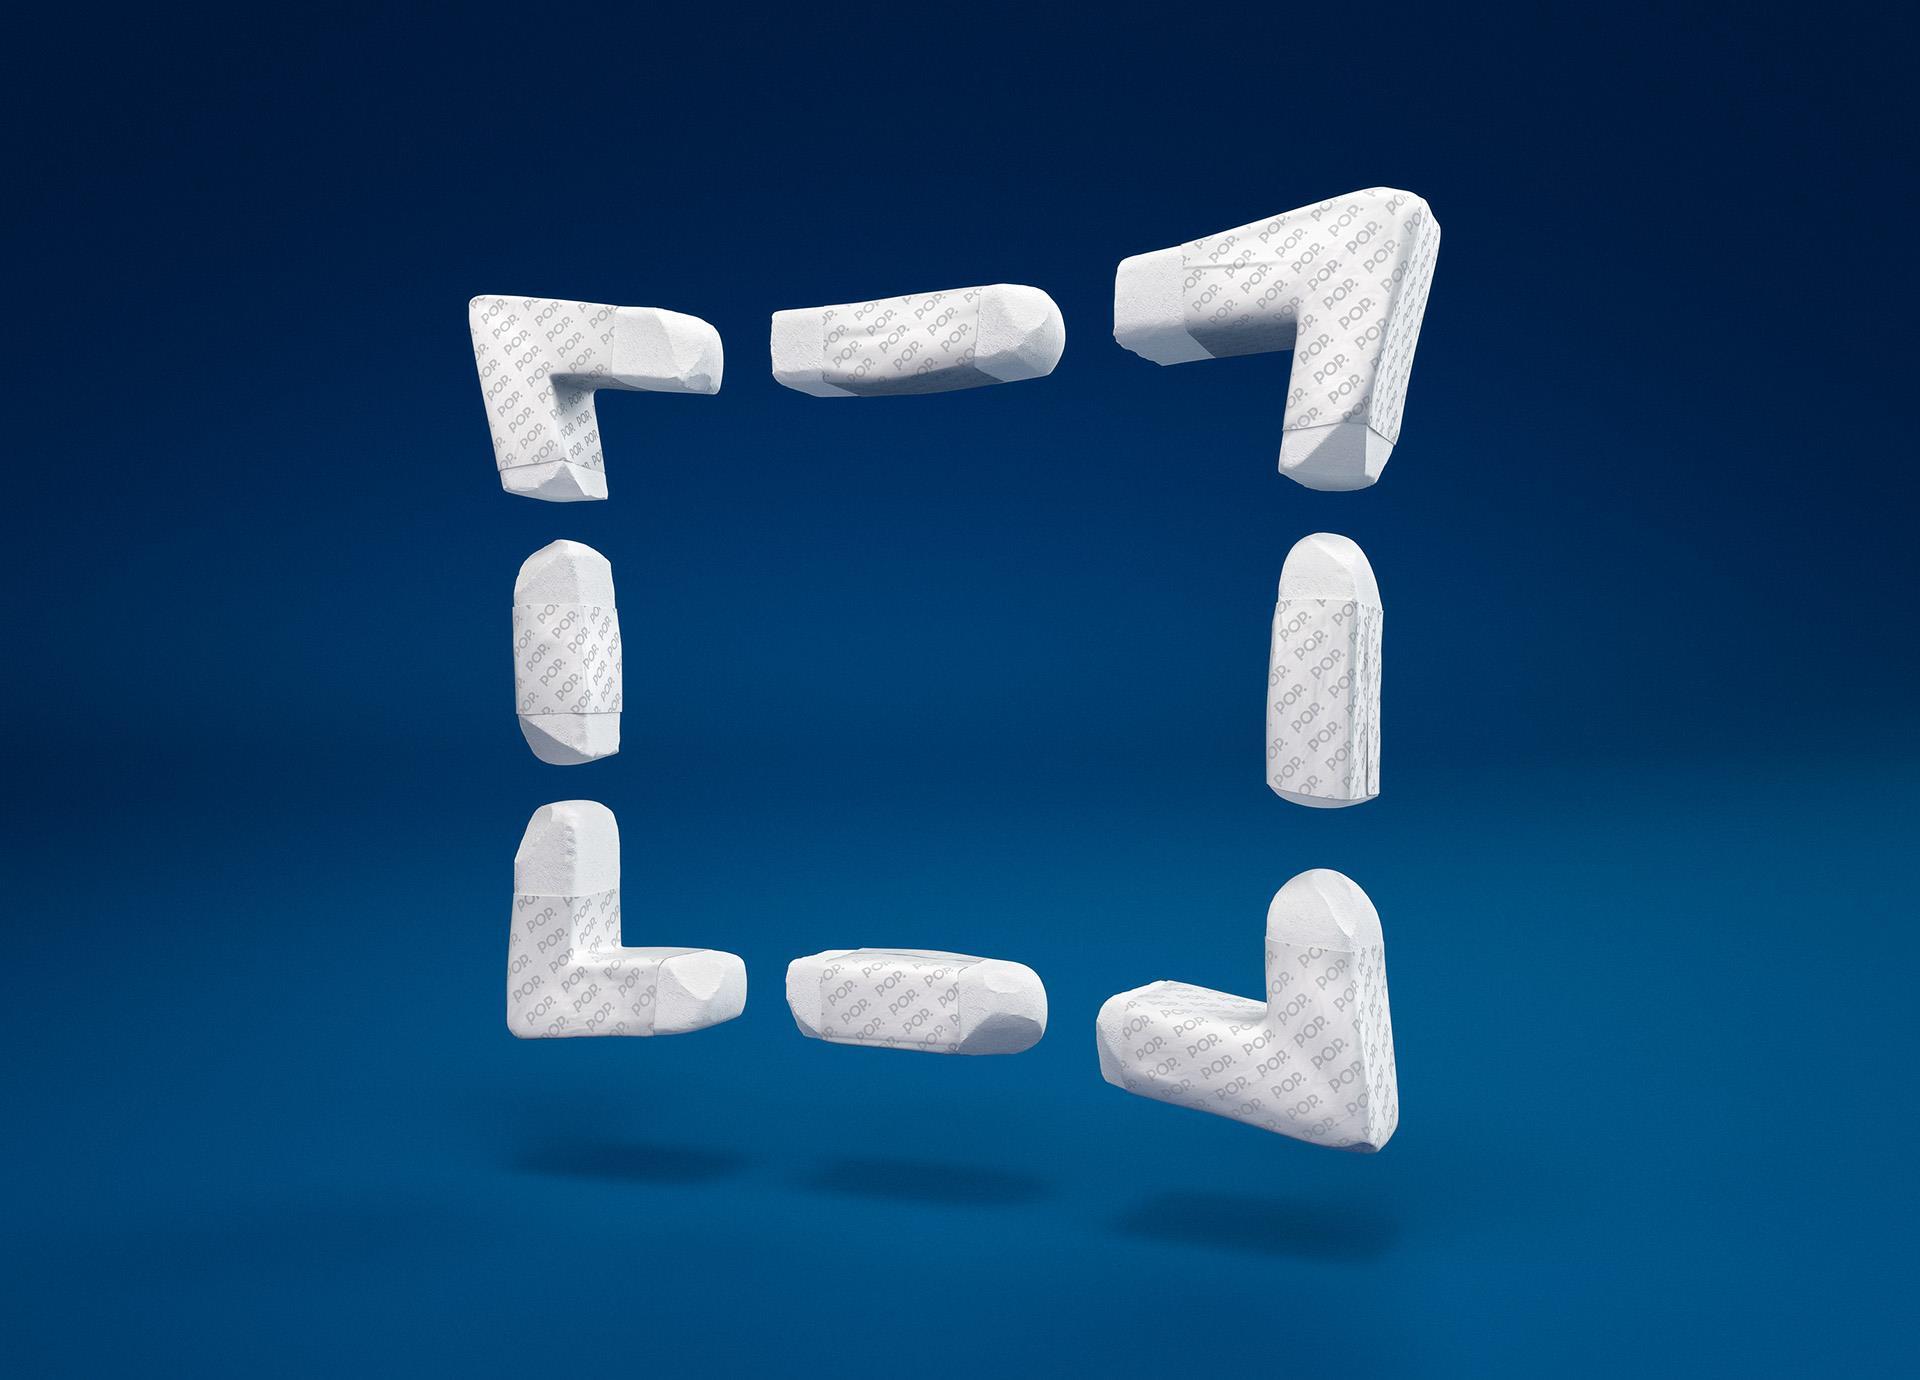 Rectangular Marquee Tool بالصور : تخيل شريط ادوات الفوتوشوب 3D